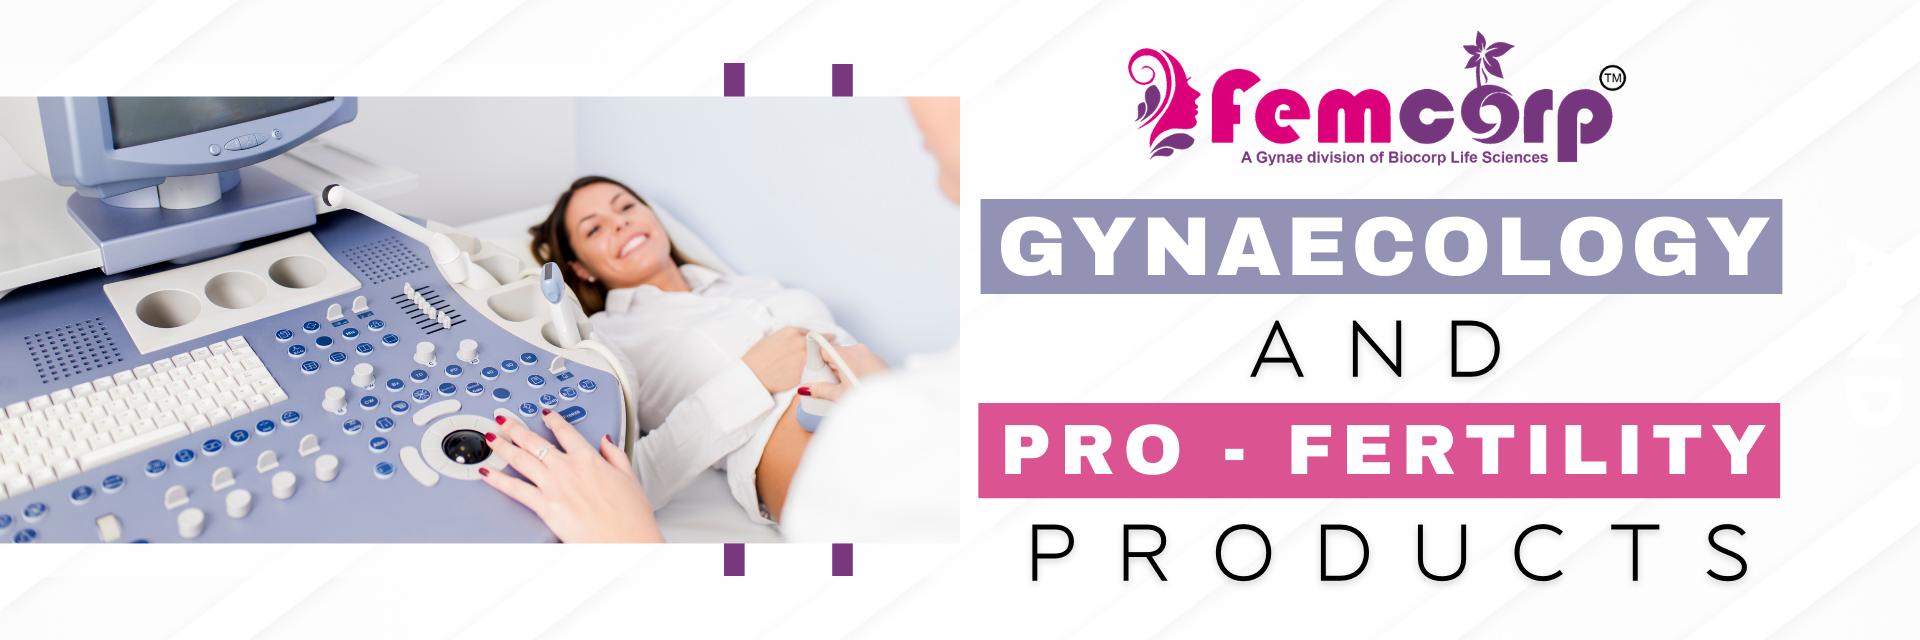 Gynae & Pro - Fertility Products